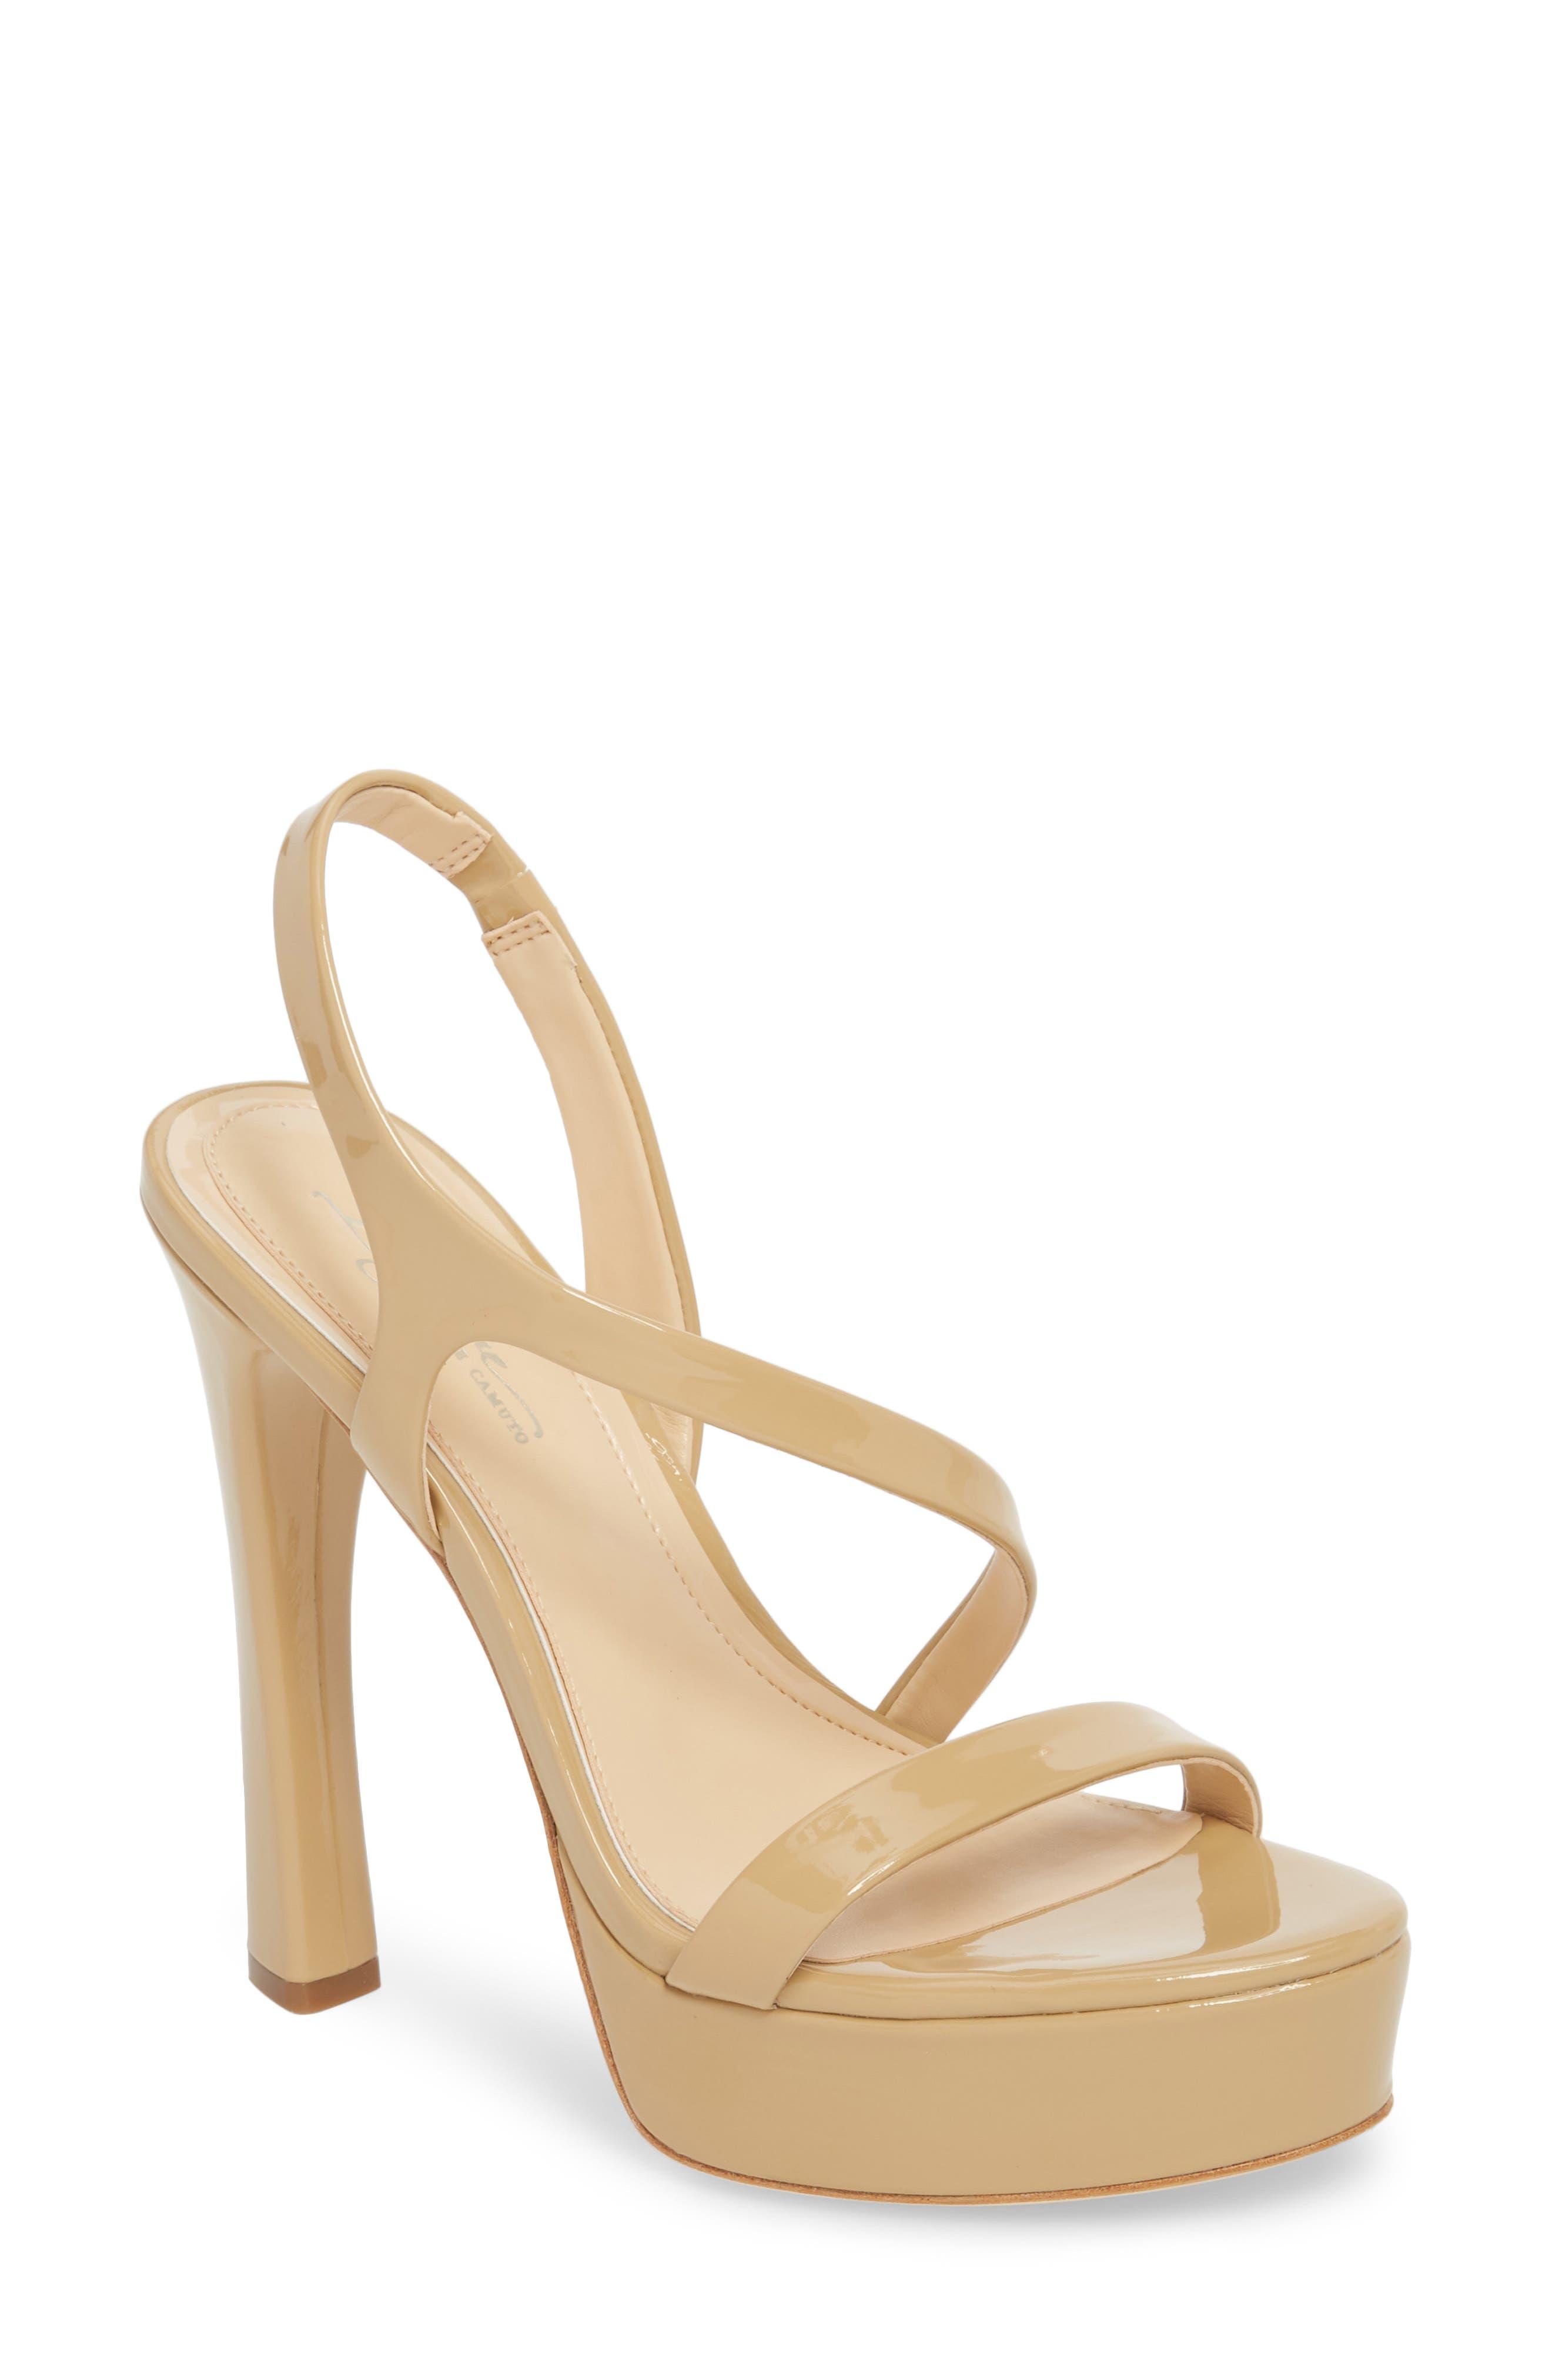 Imagine By Vince Camuto Piera Platform Sandal- Beige